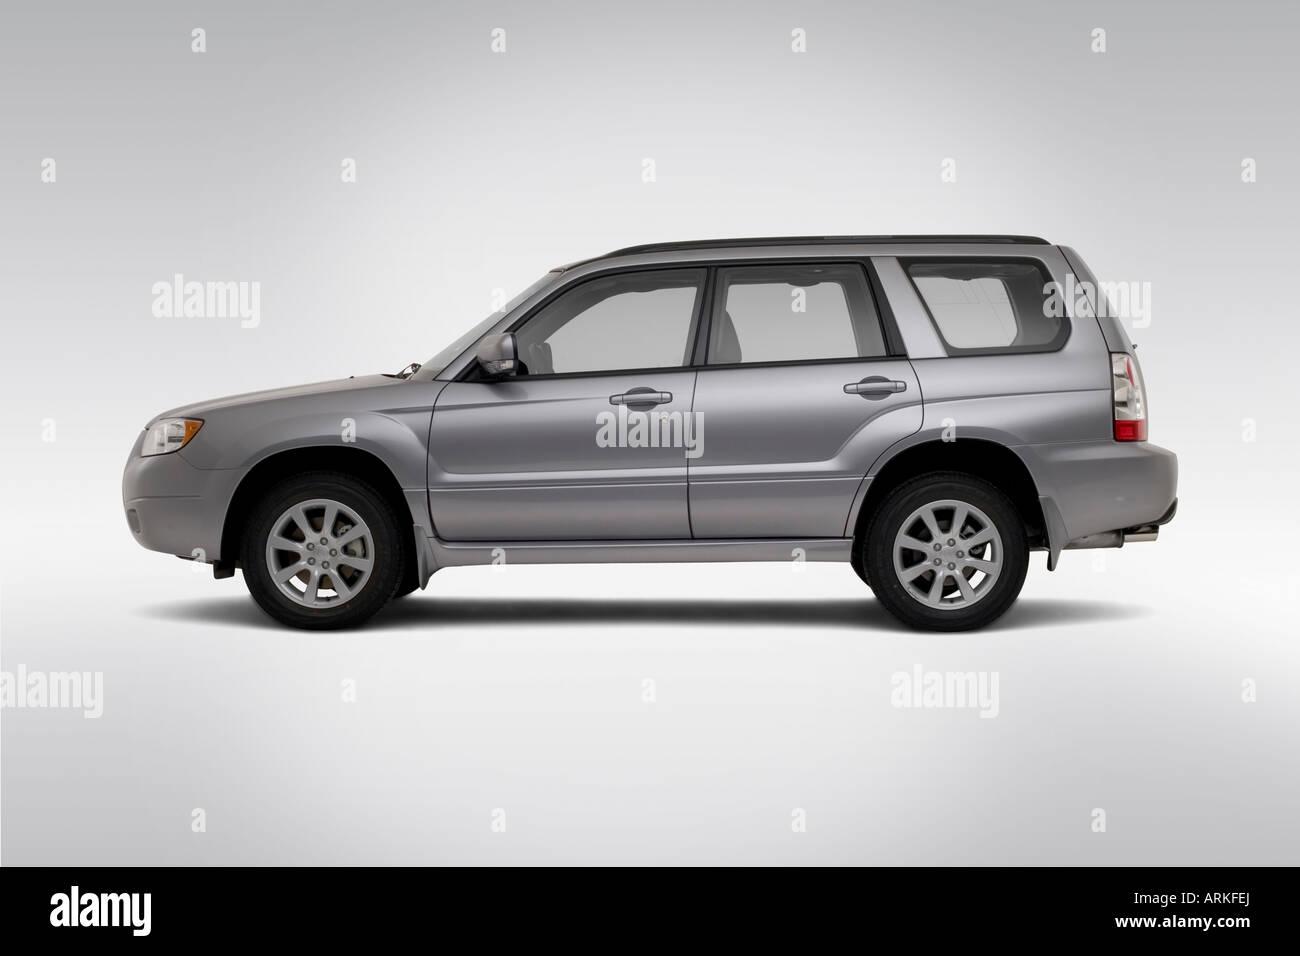 2008 subaru forester 2.5 x premium in silver - drivers side